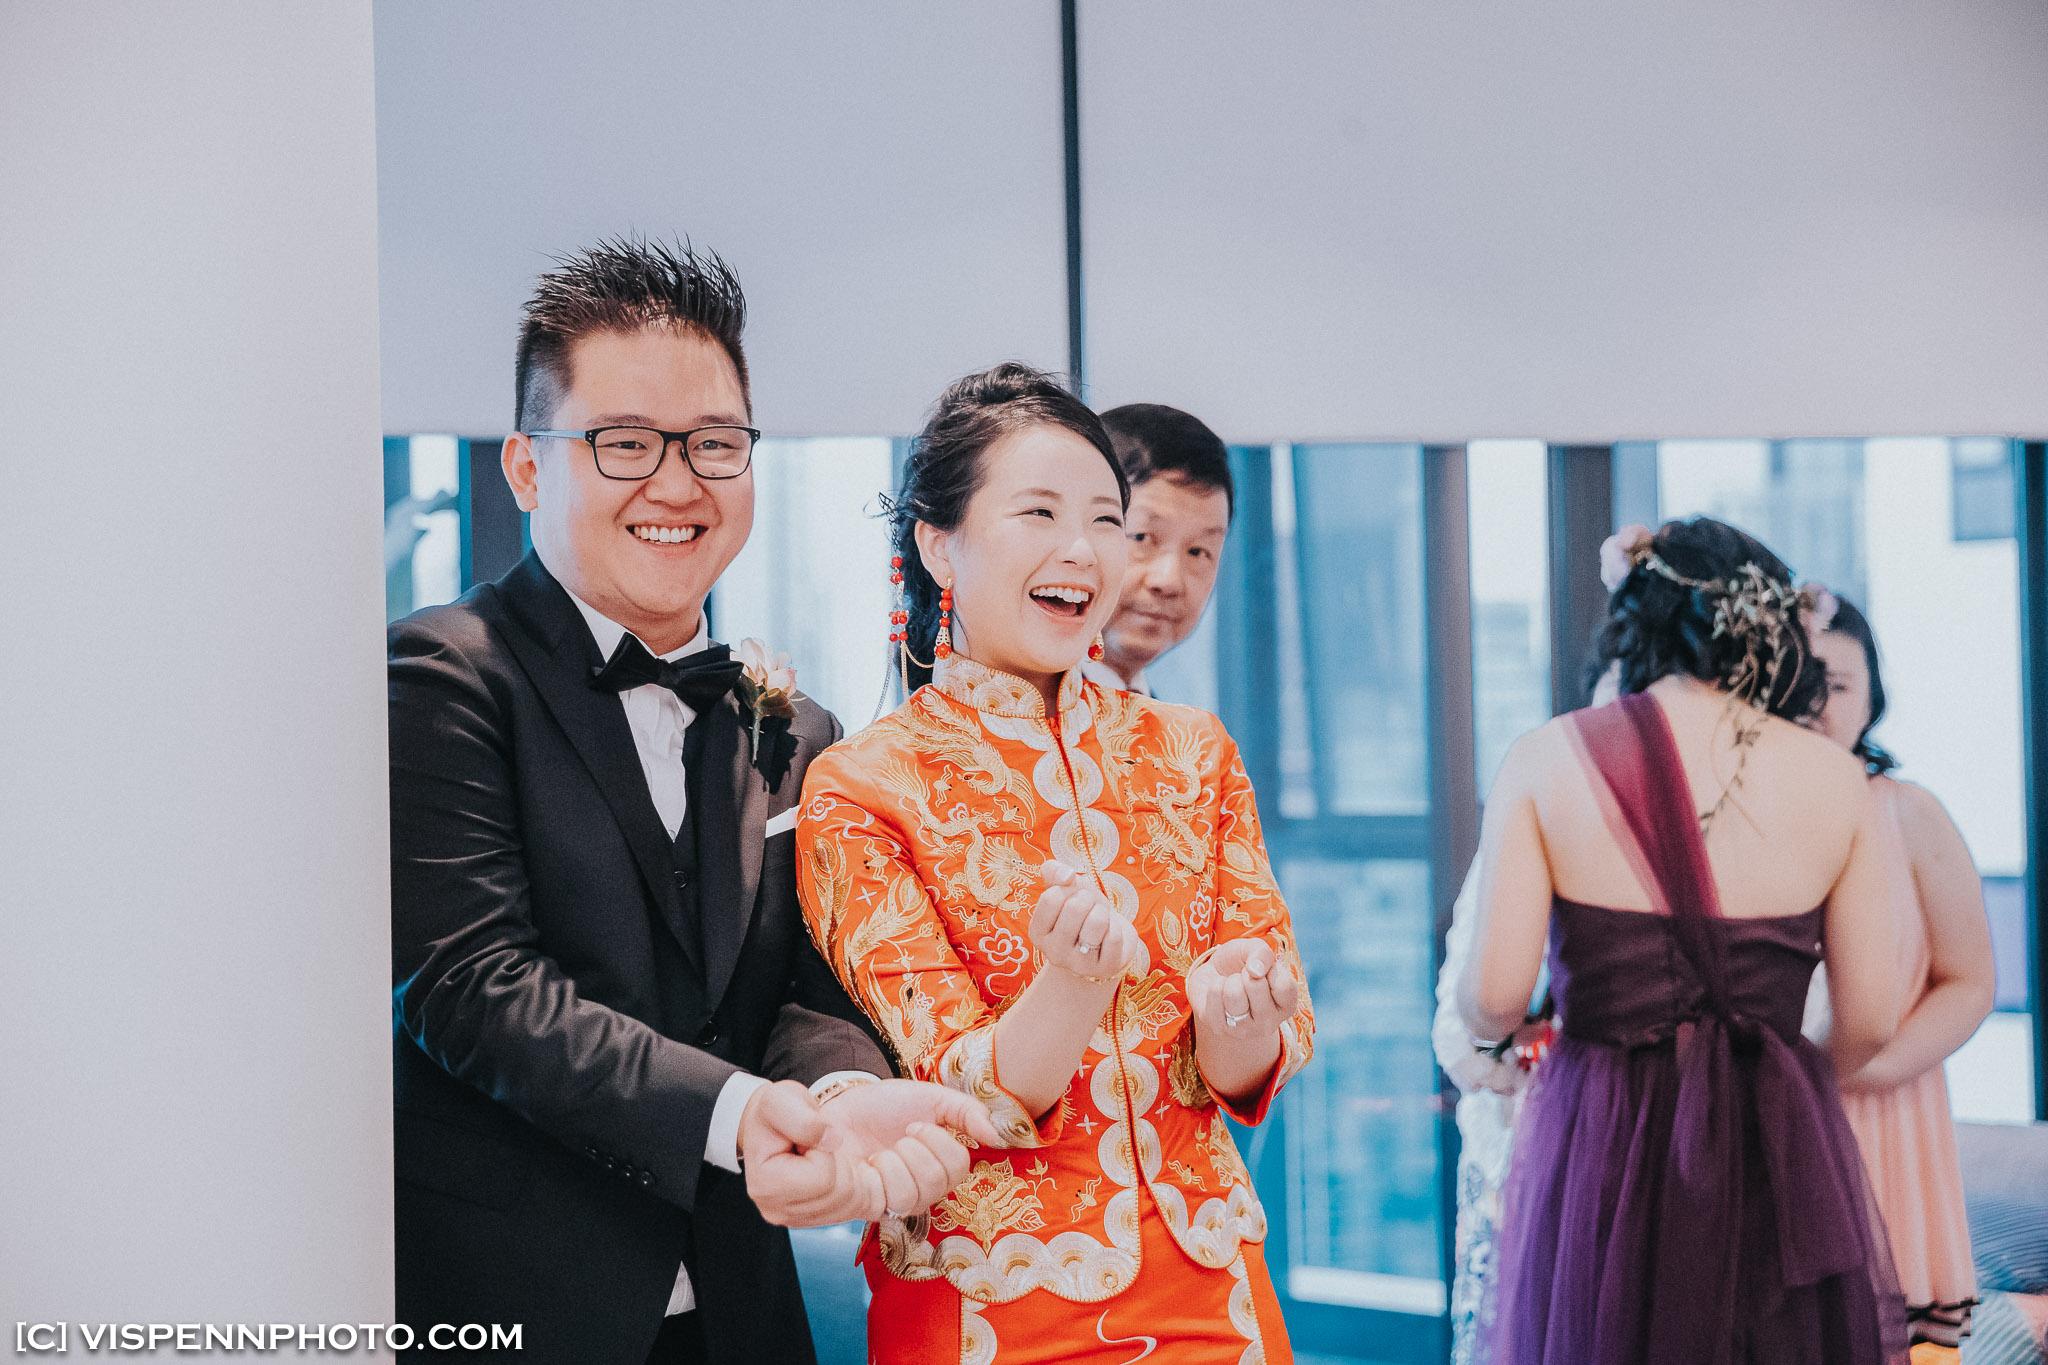 WEDDING DAY Photography Melbourne VISPENN 墨尔本 婚礼跟拍 婚礼摄像 婚礼摄影 结婚照 登记照 1DX 1495